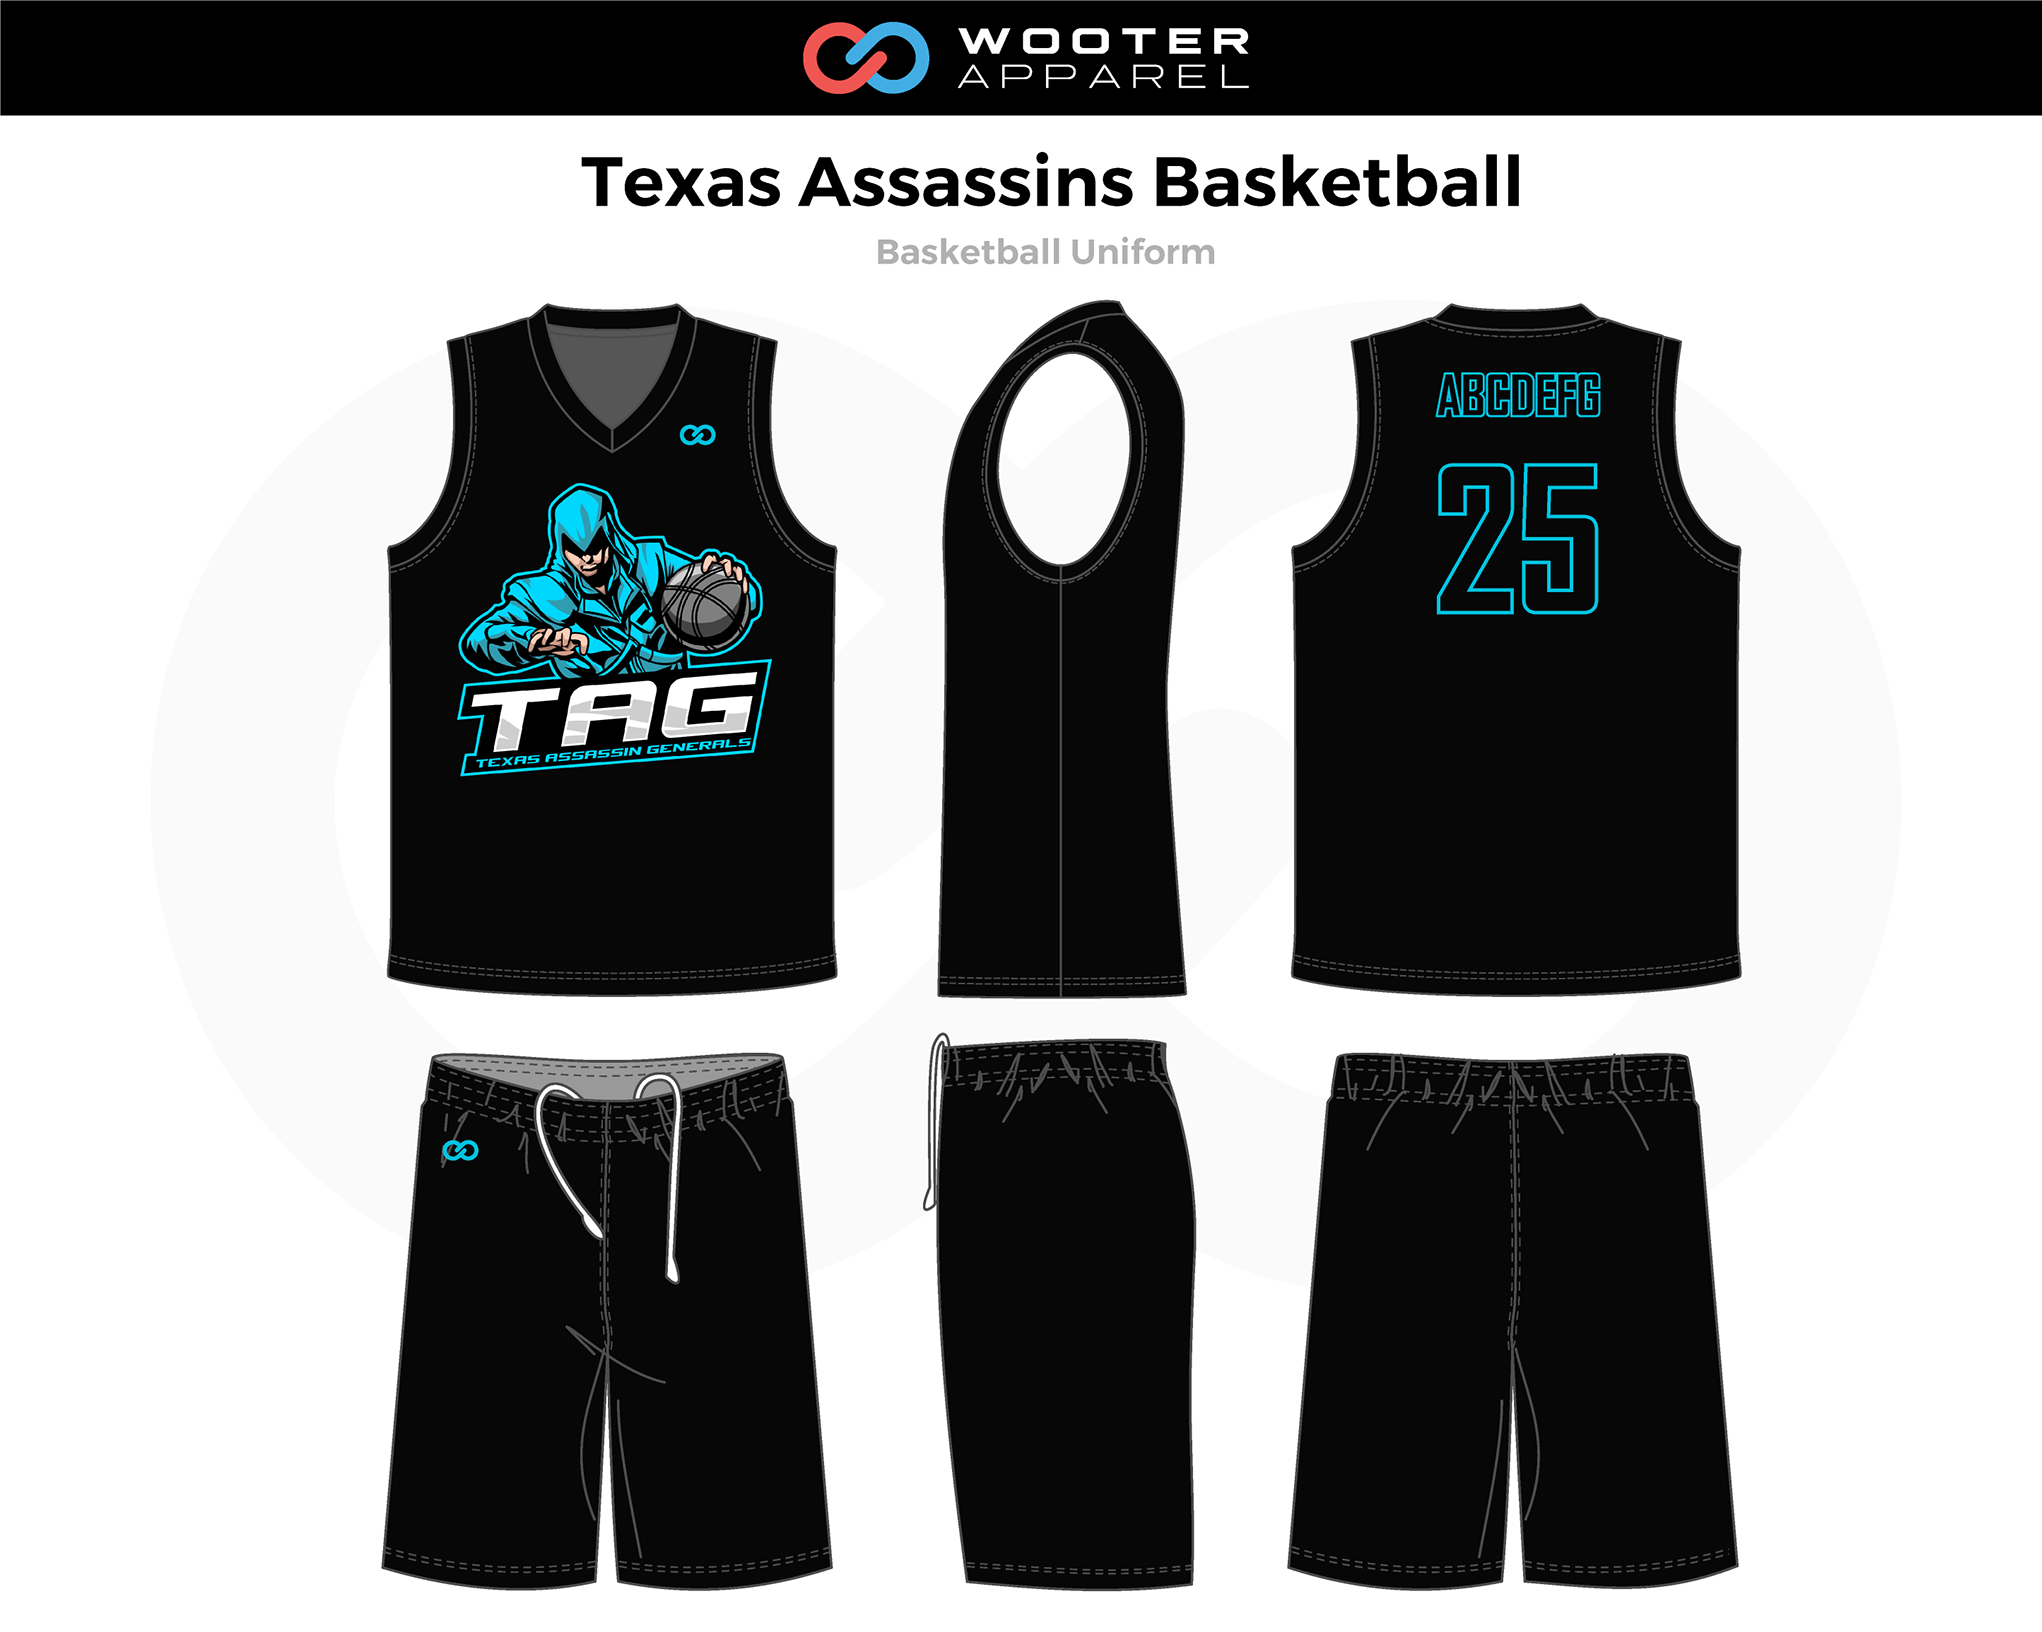 TEXAS ASSASSINS Black Blue White Basketball Uniform, Jersey and Shorts